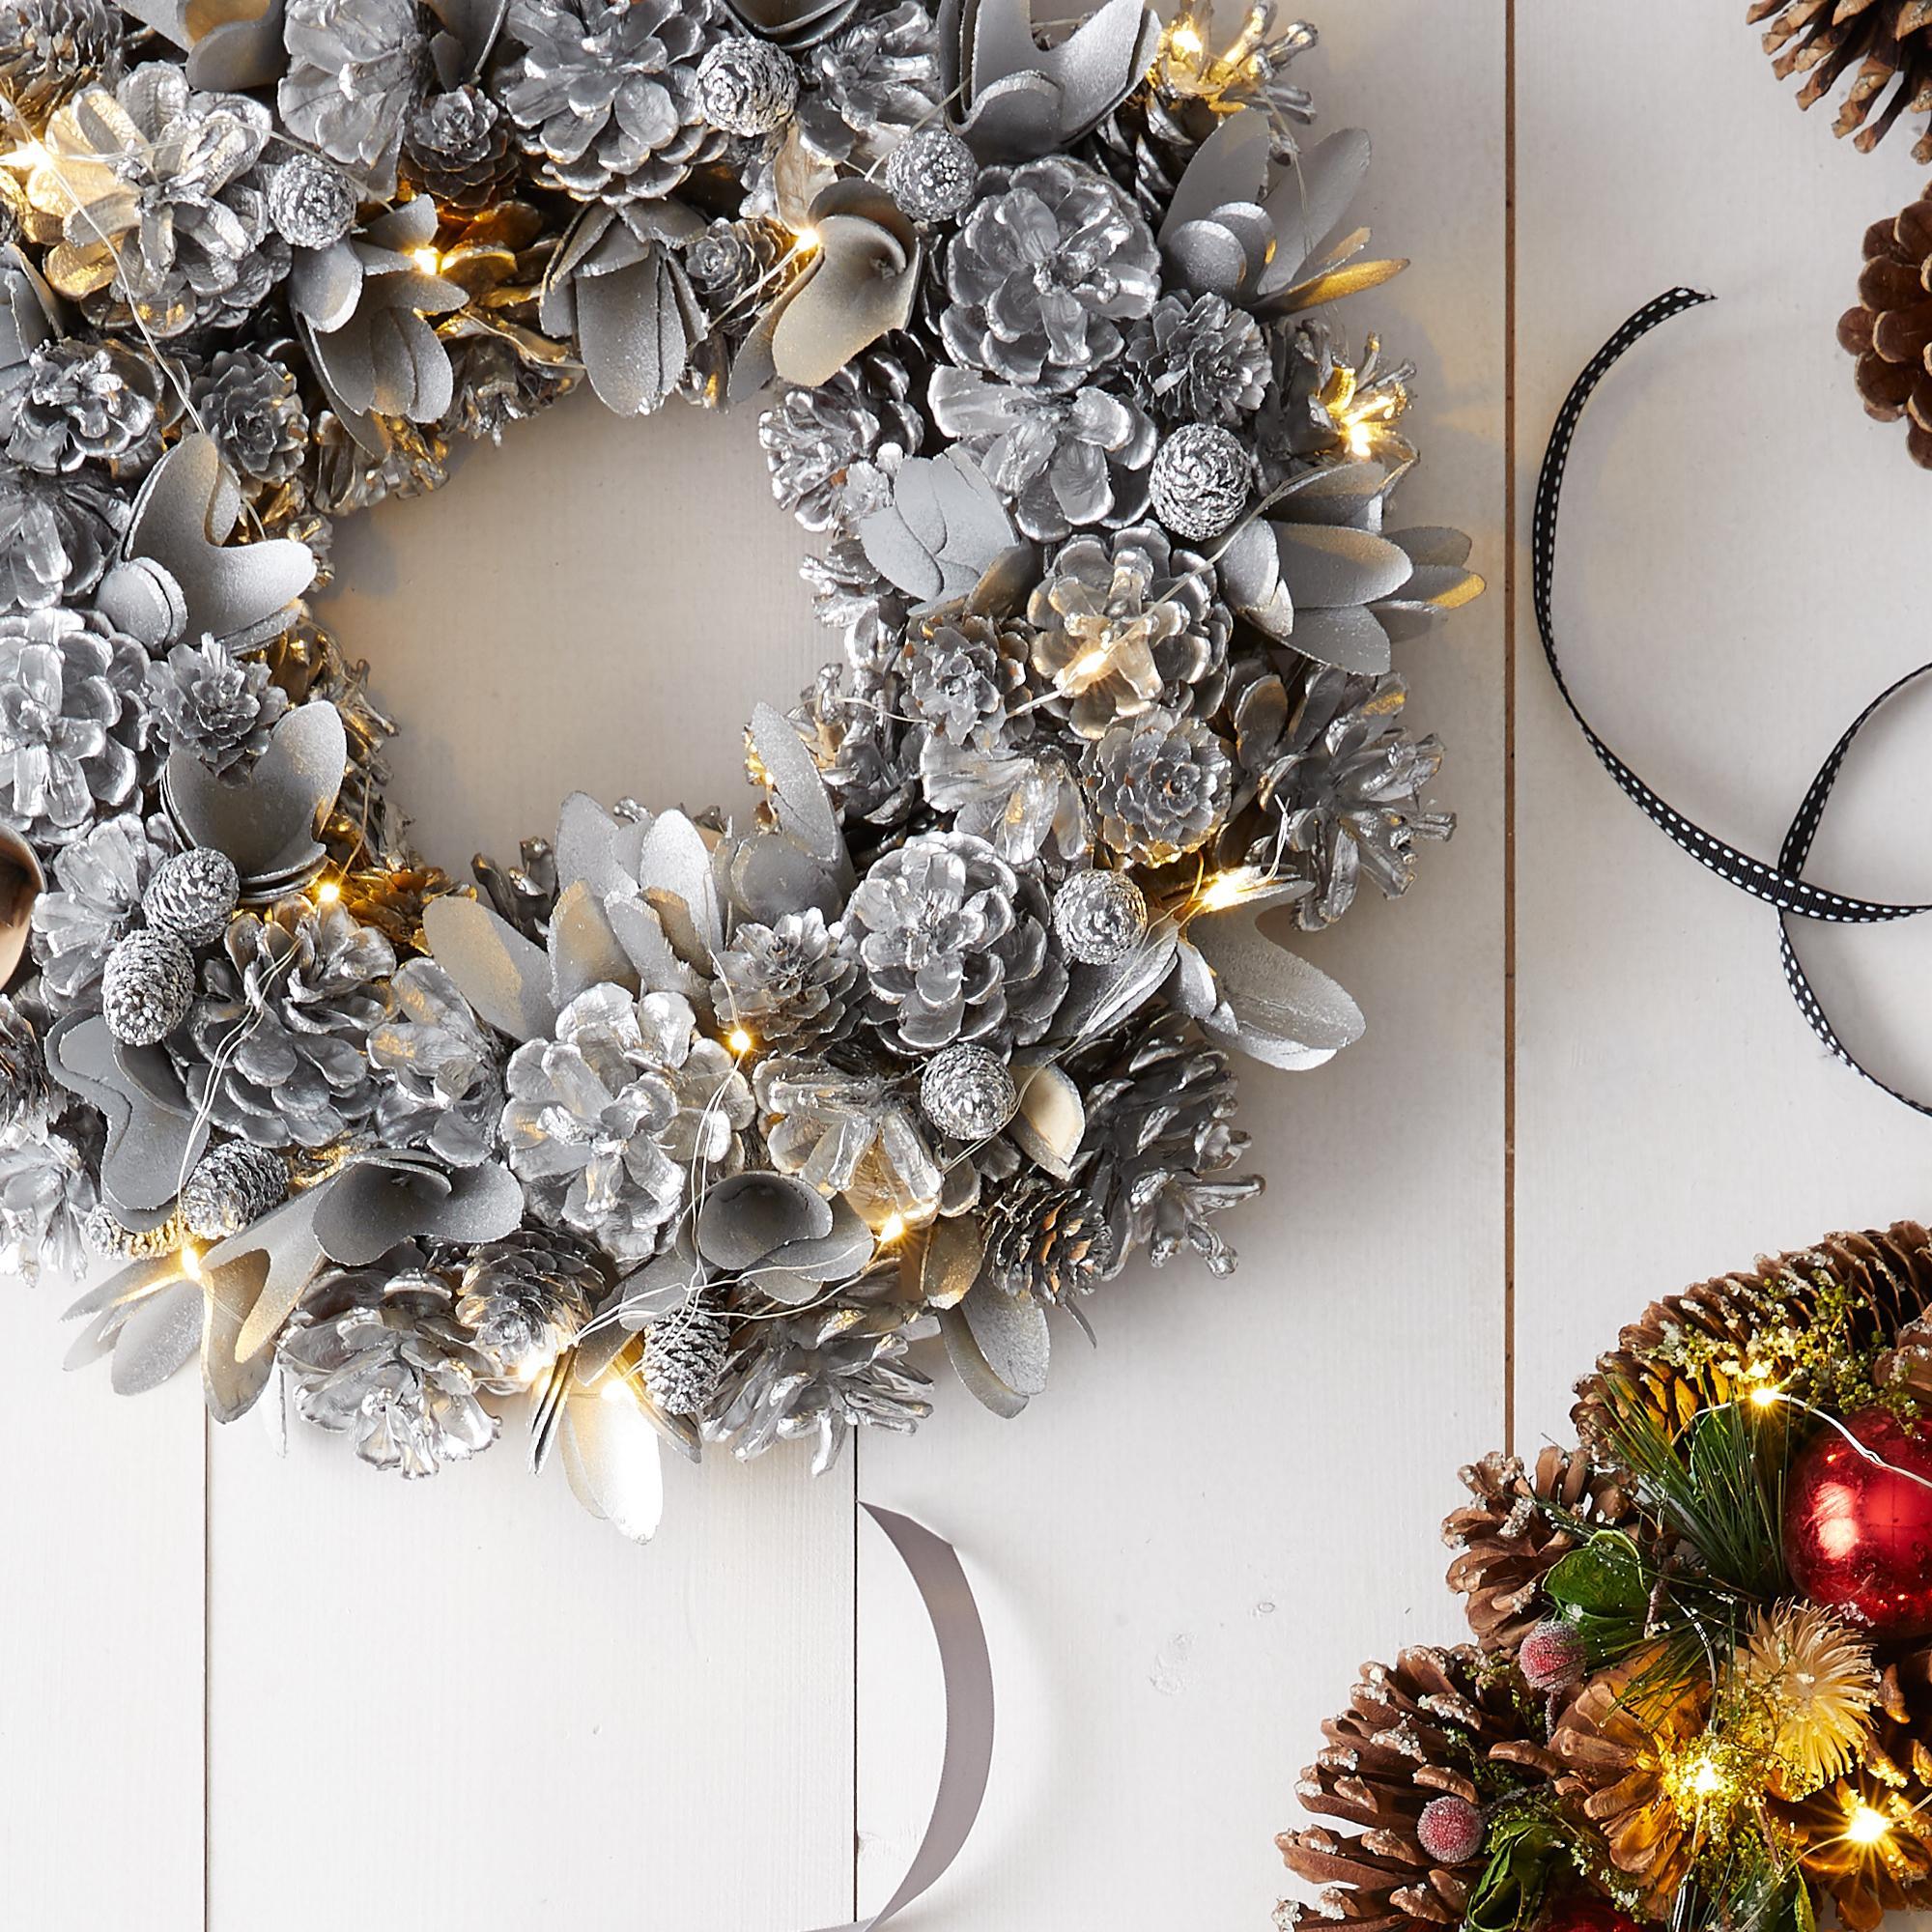 Silver Christmas Wreath.Led Festive Silver Christmas Wreath Cancer Research Uk